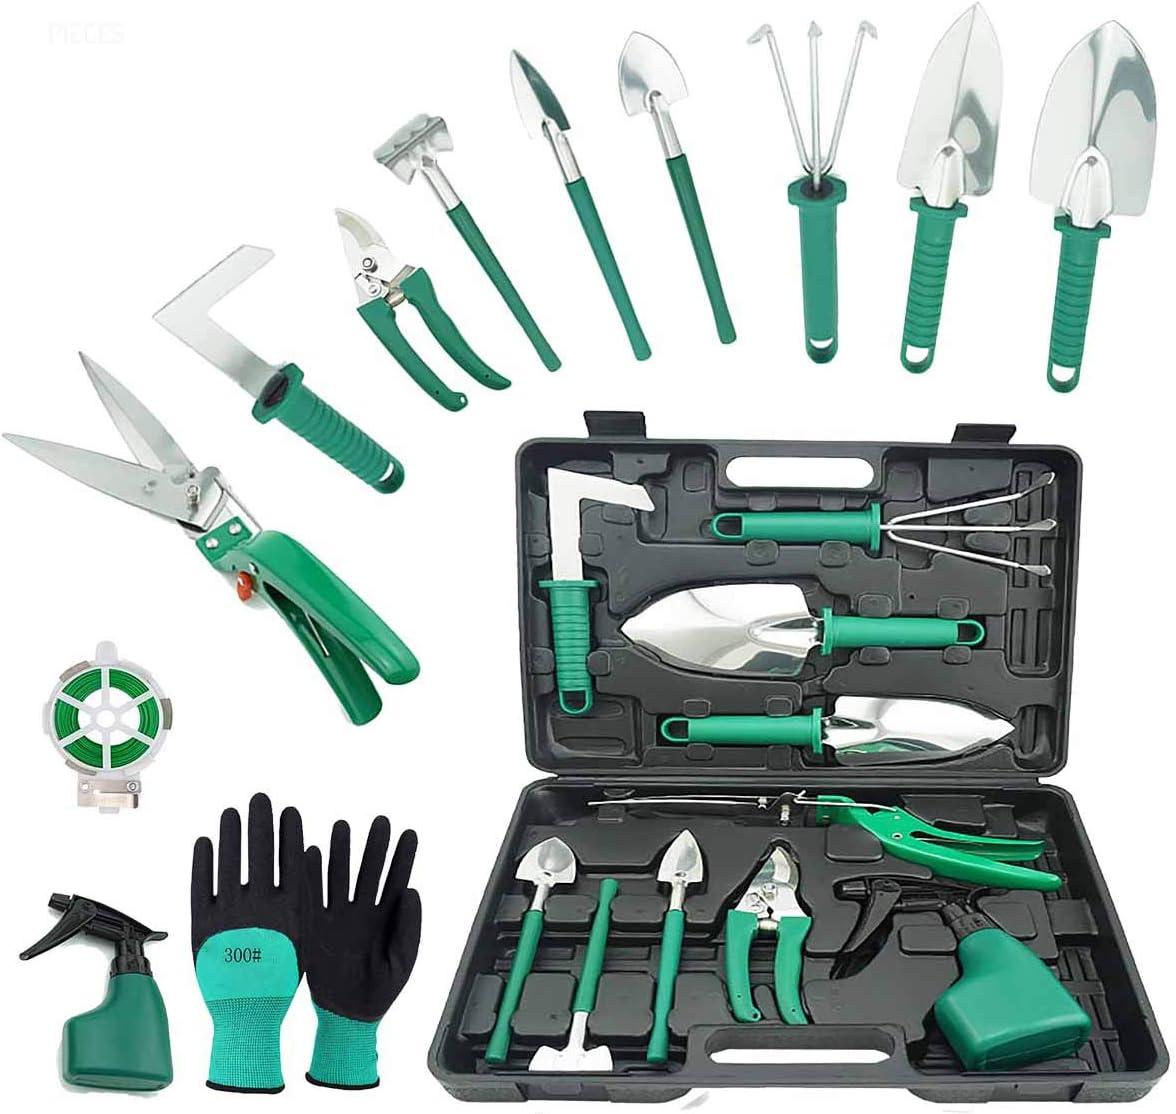 TOORGGOO Gardening Tool Sets,13Piece Stainless Steel Garden Tool Set with Storage Case with Garden Trowel Pruners Shovel,Trowel,Sprayer,and More -Gardening Gifts for Women Men(Green)